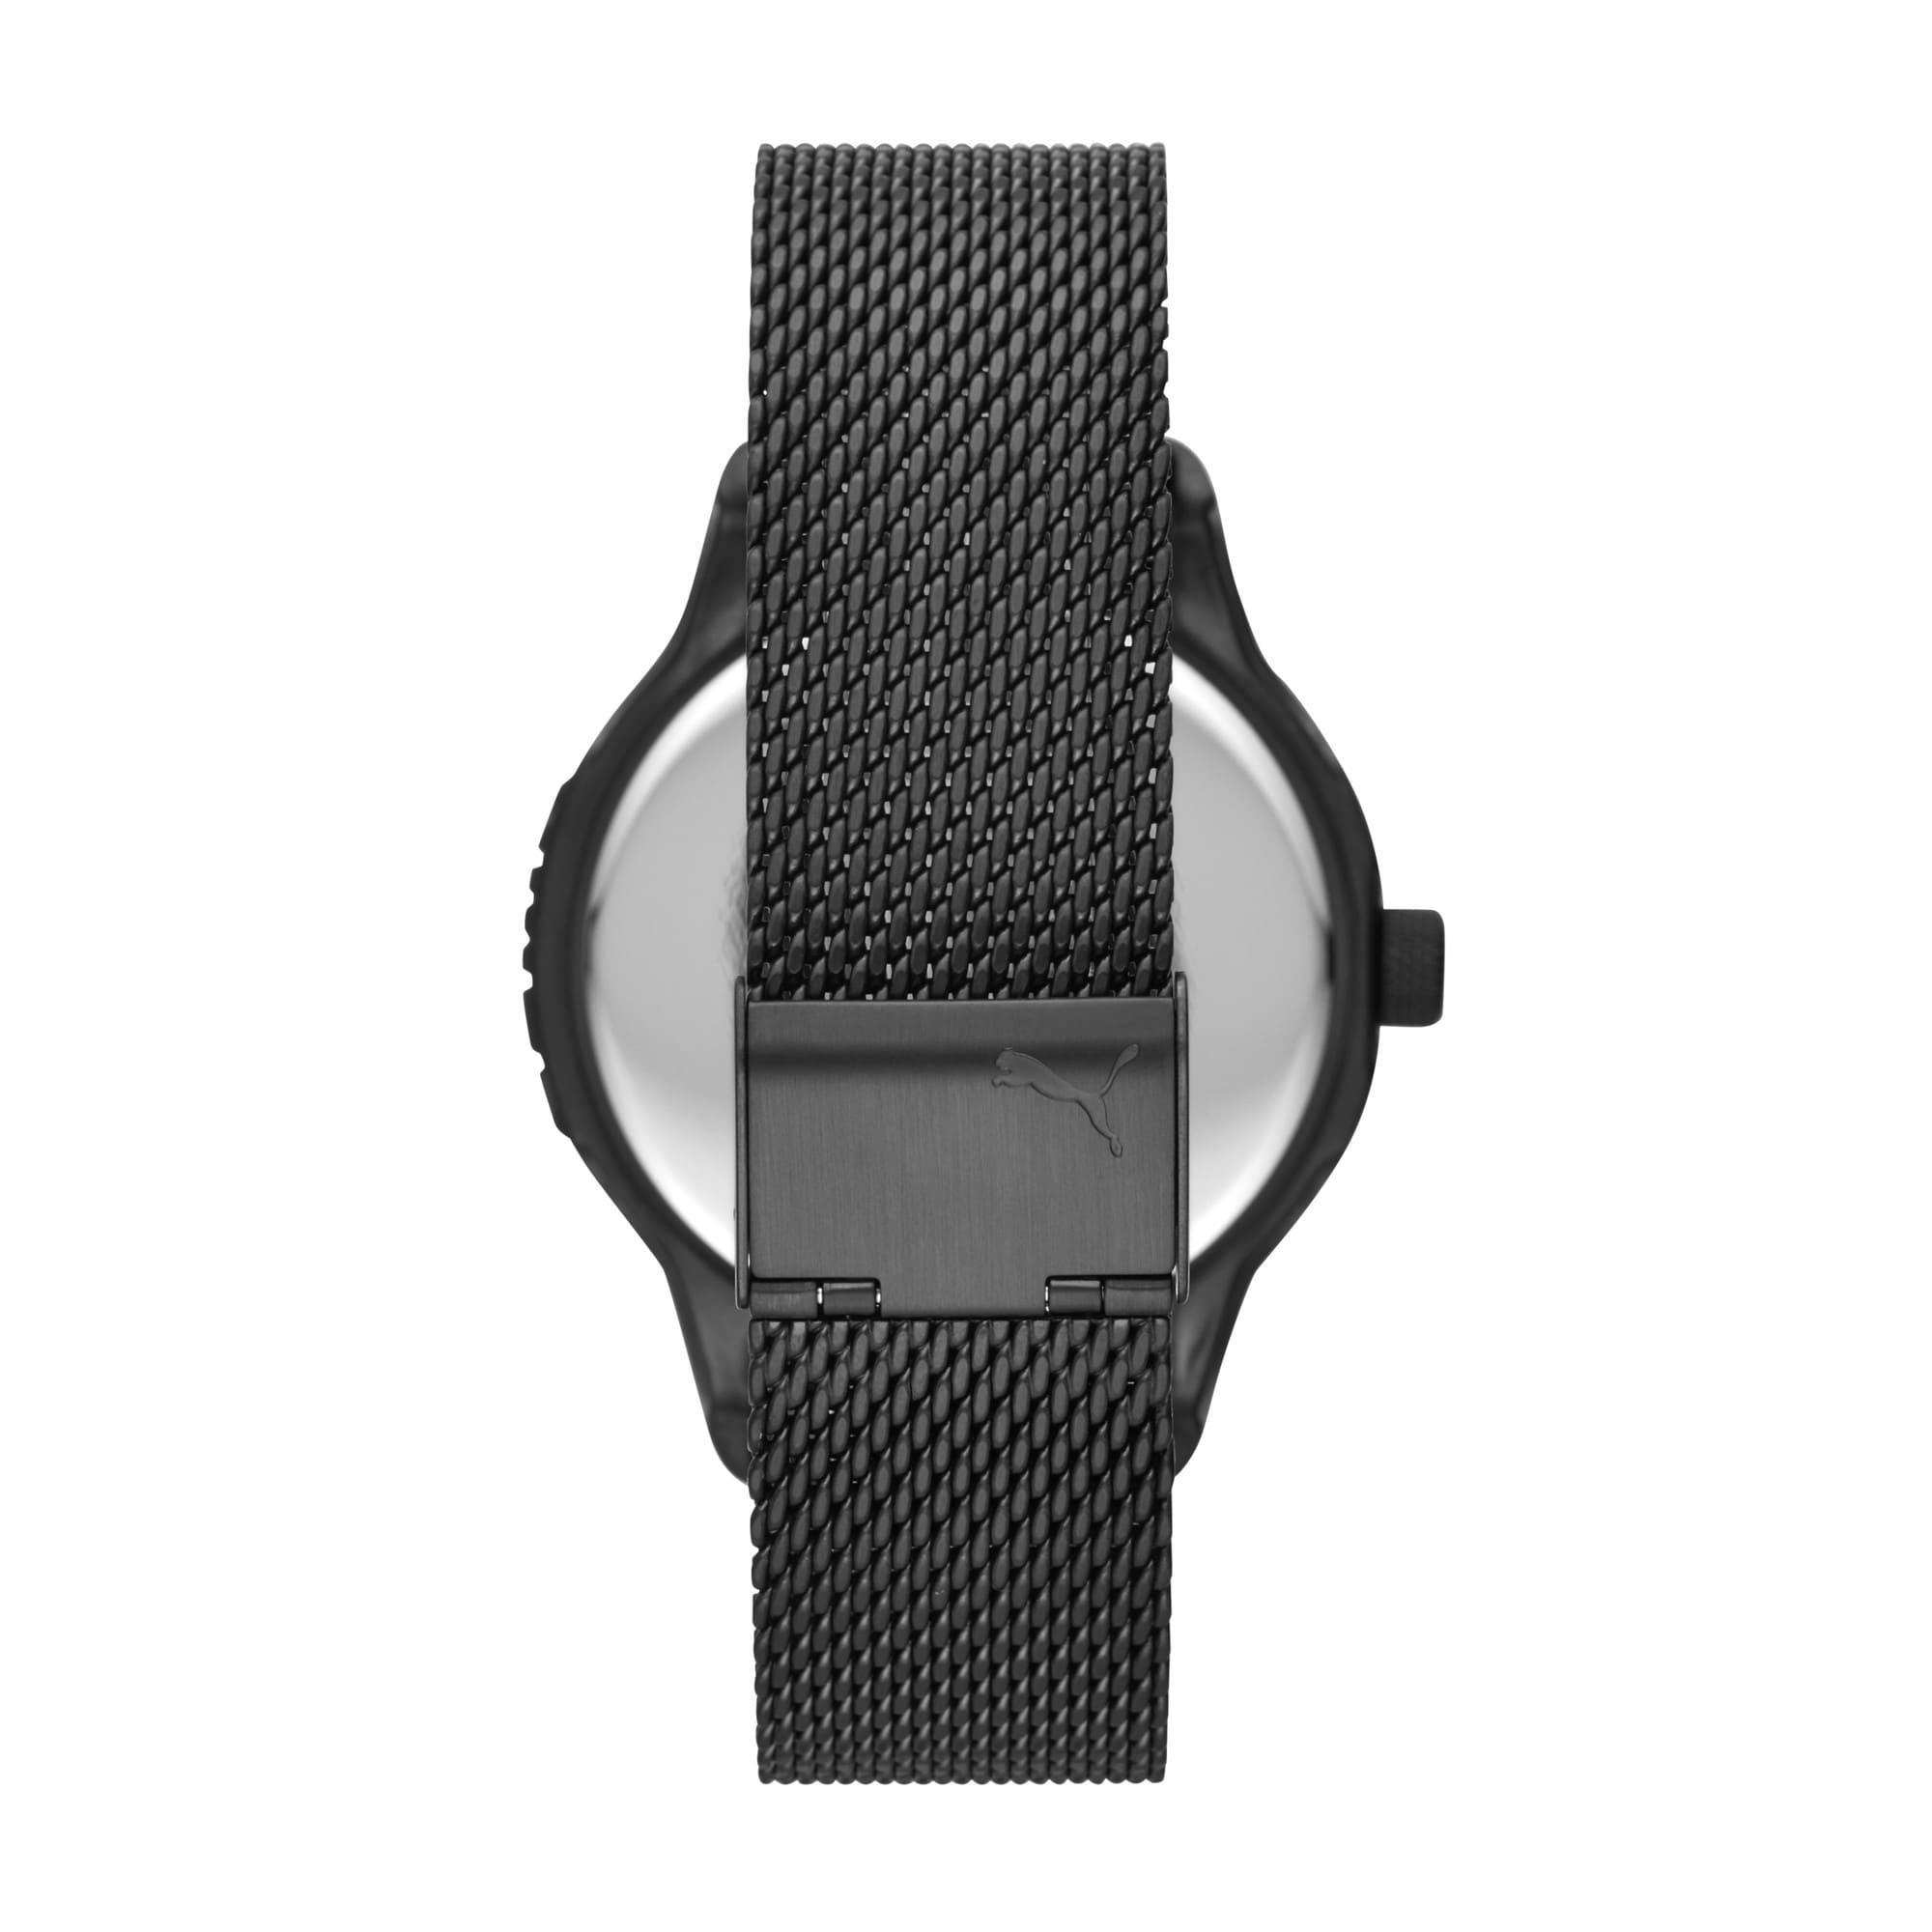 Thumbnail 2 of Reset v1 Watch, Black/Black, medium